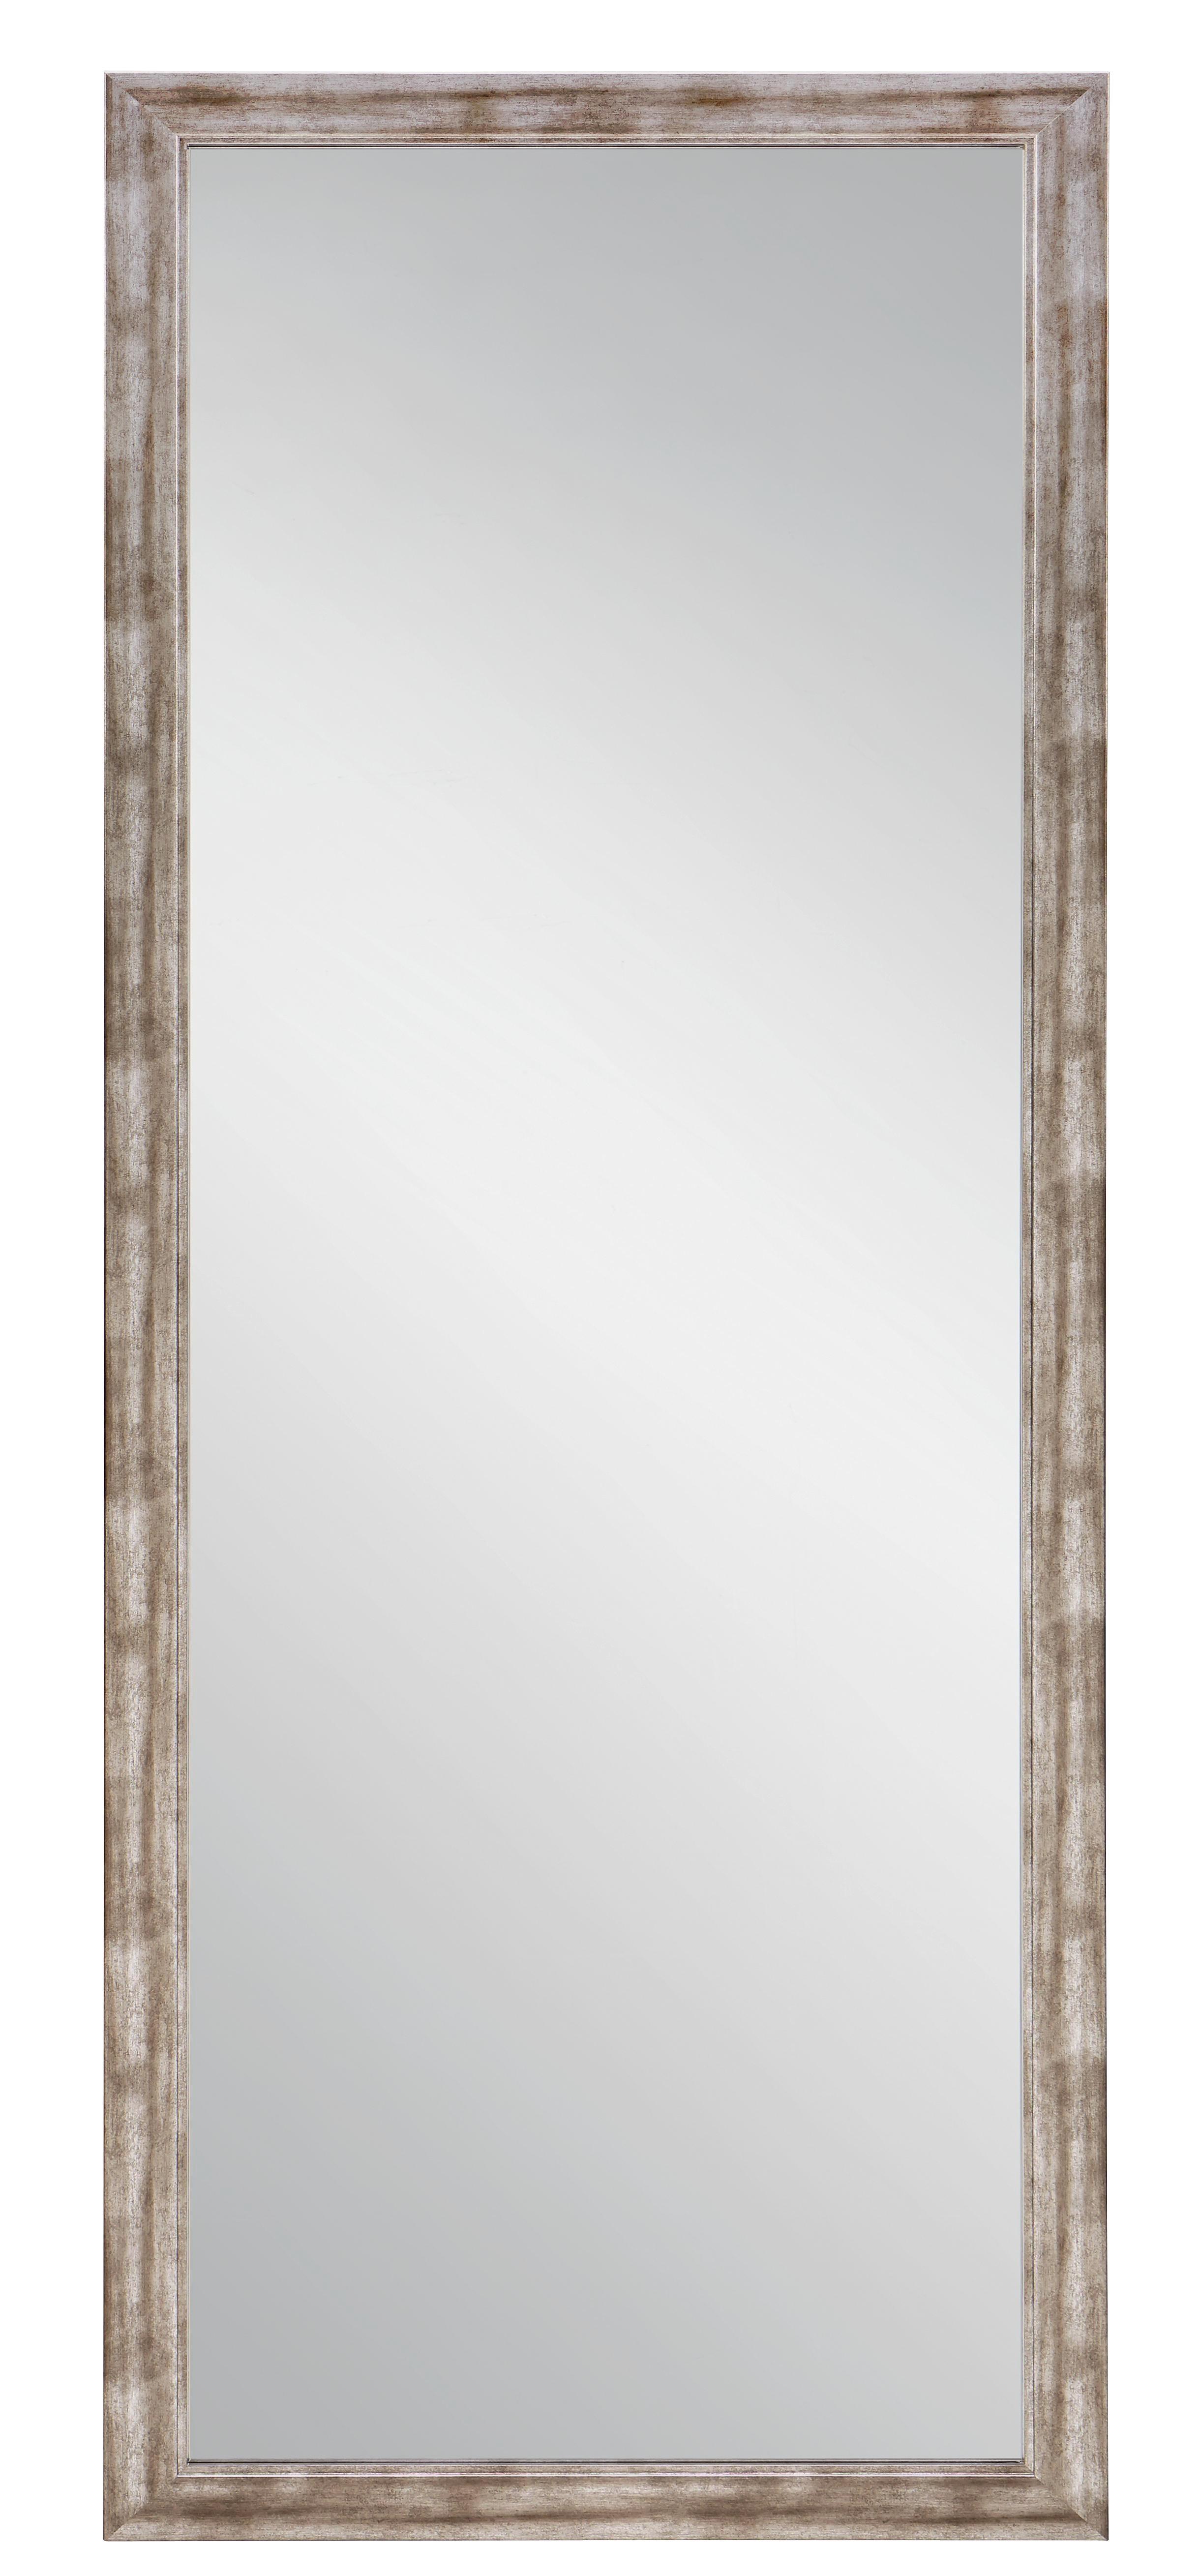 Wandspiegel ca. 66x186x2cm - Silberfarben/Nickelfarben, Holzwerkstoff (66/186cm) - MÖMAX modern living